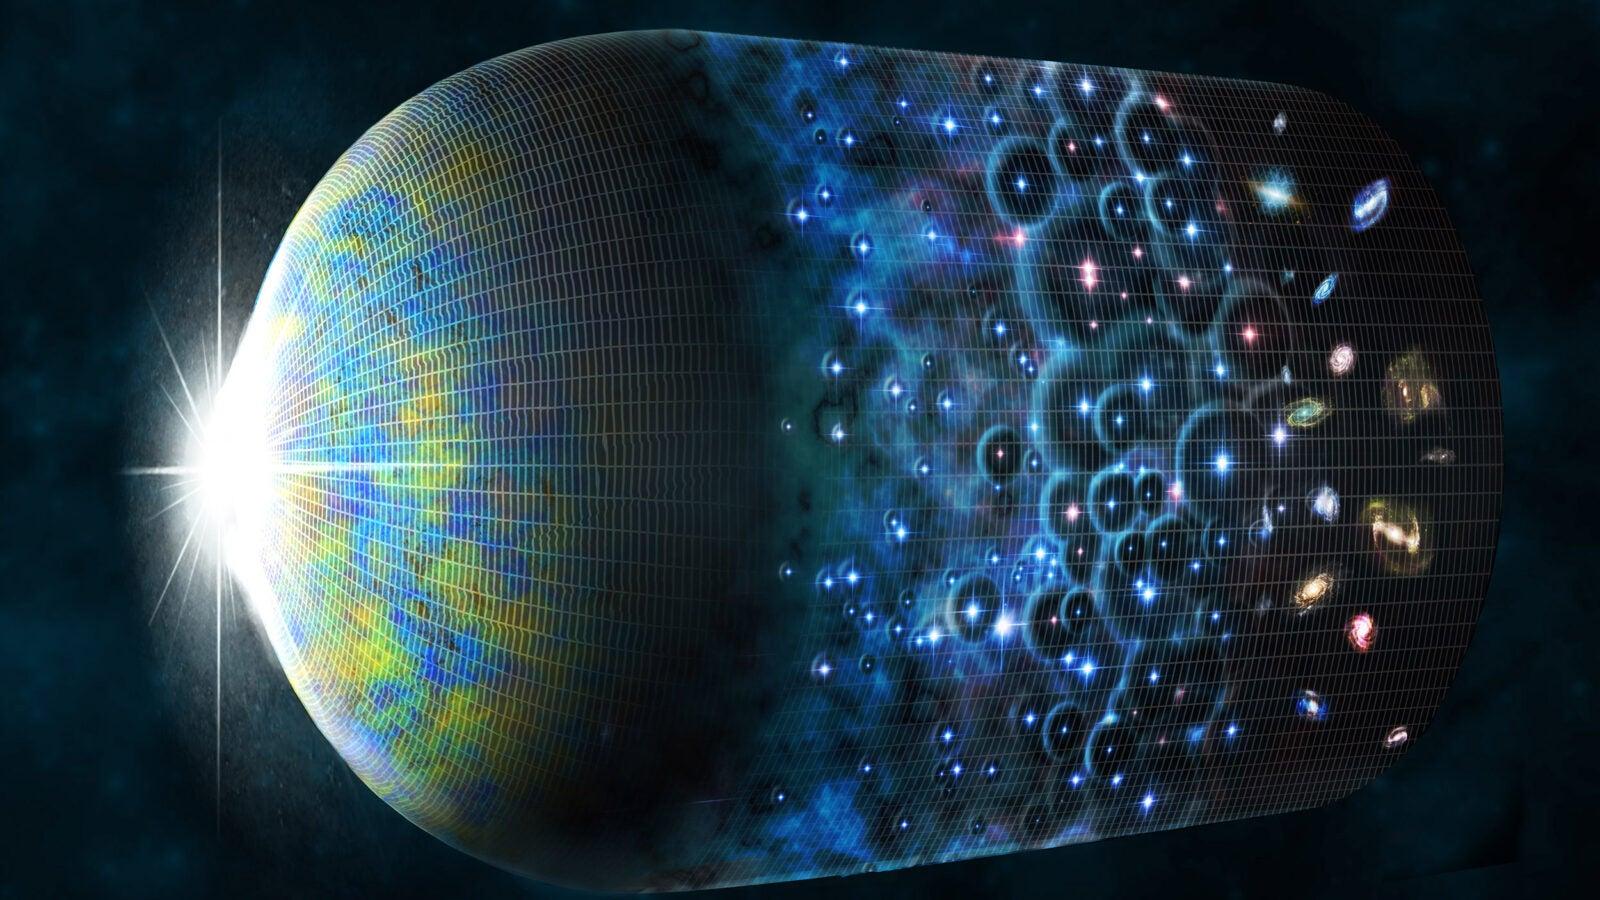 Big Bang artwork